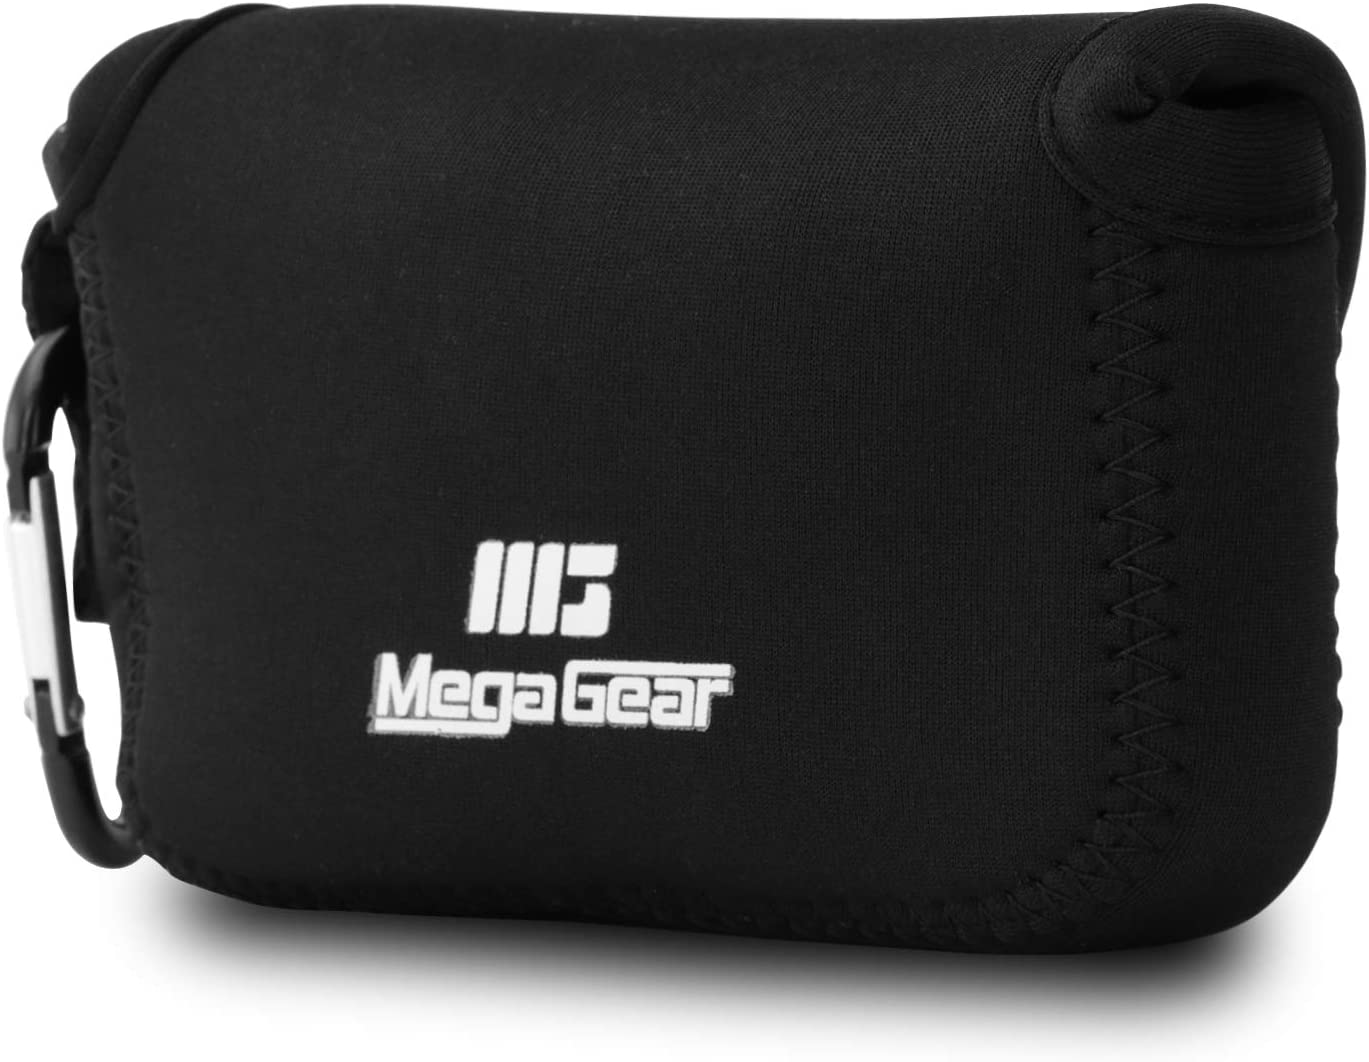 MegaGear Funda de Neopreno Ultraligera para cámara Canon PowerShot SX720 HS, SX710 HS, SX700 HS, SX170 IS, G16, G15, SX160 IS, Sony Cyber-Shot DSC‑HX60V, DSC-HX50V (Negro)